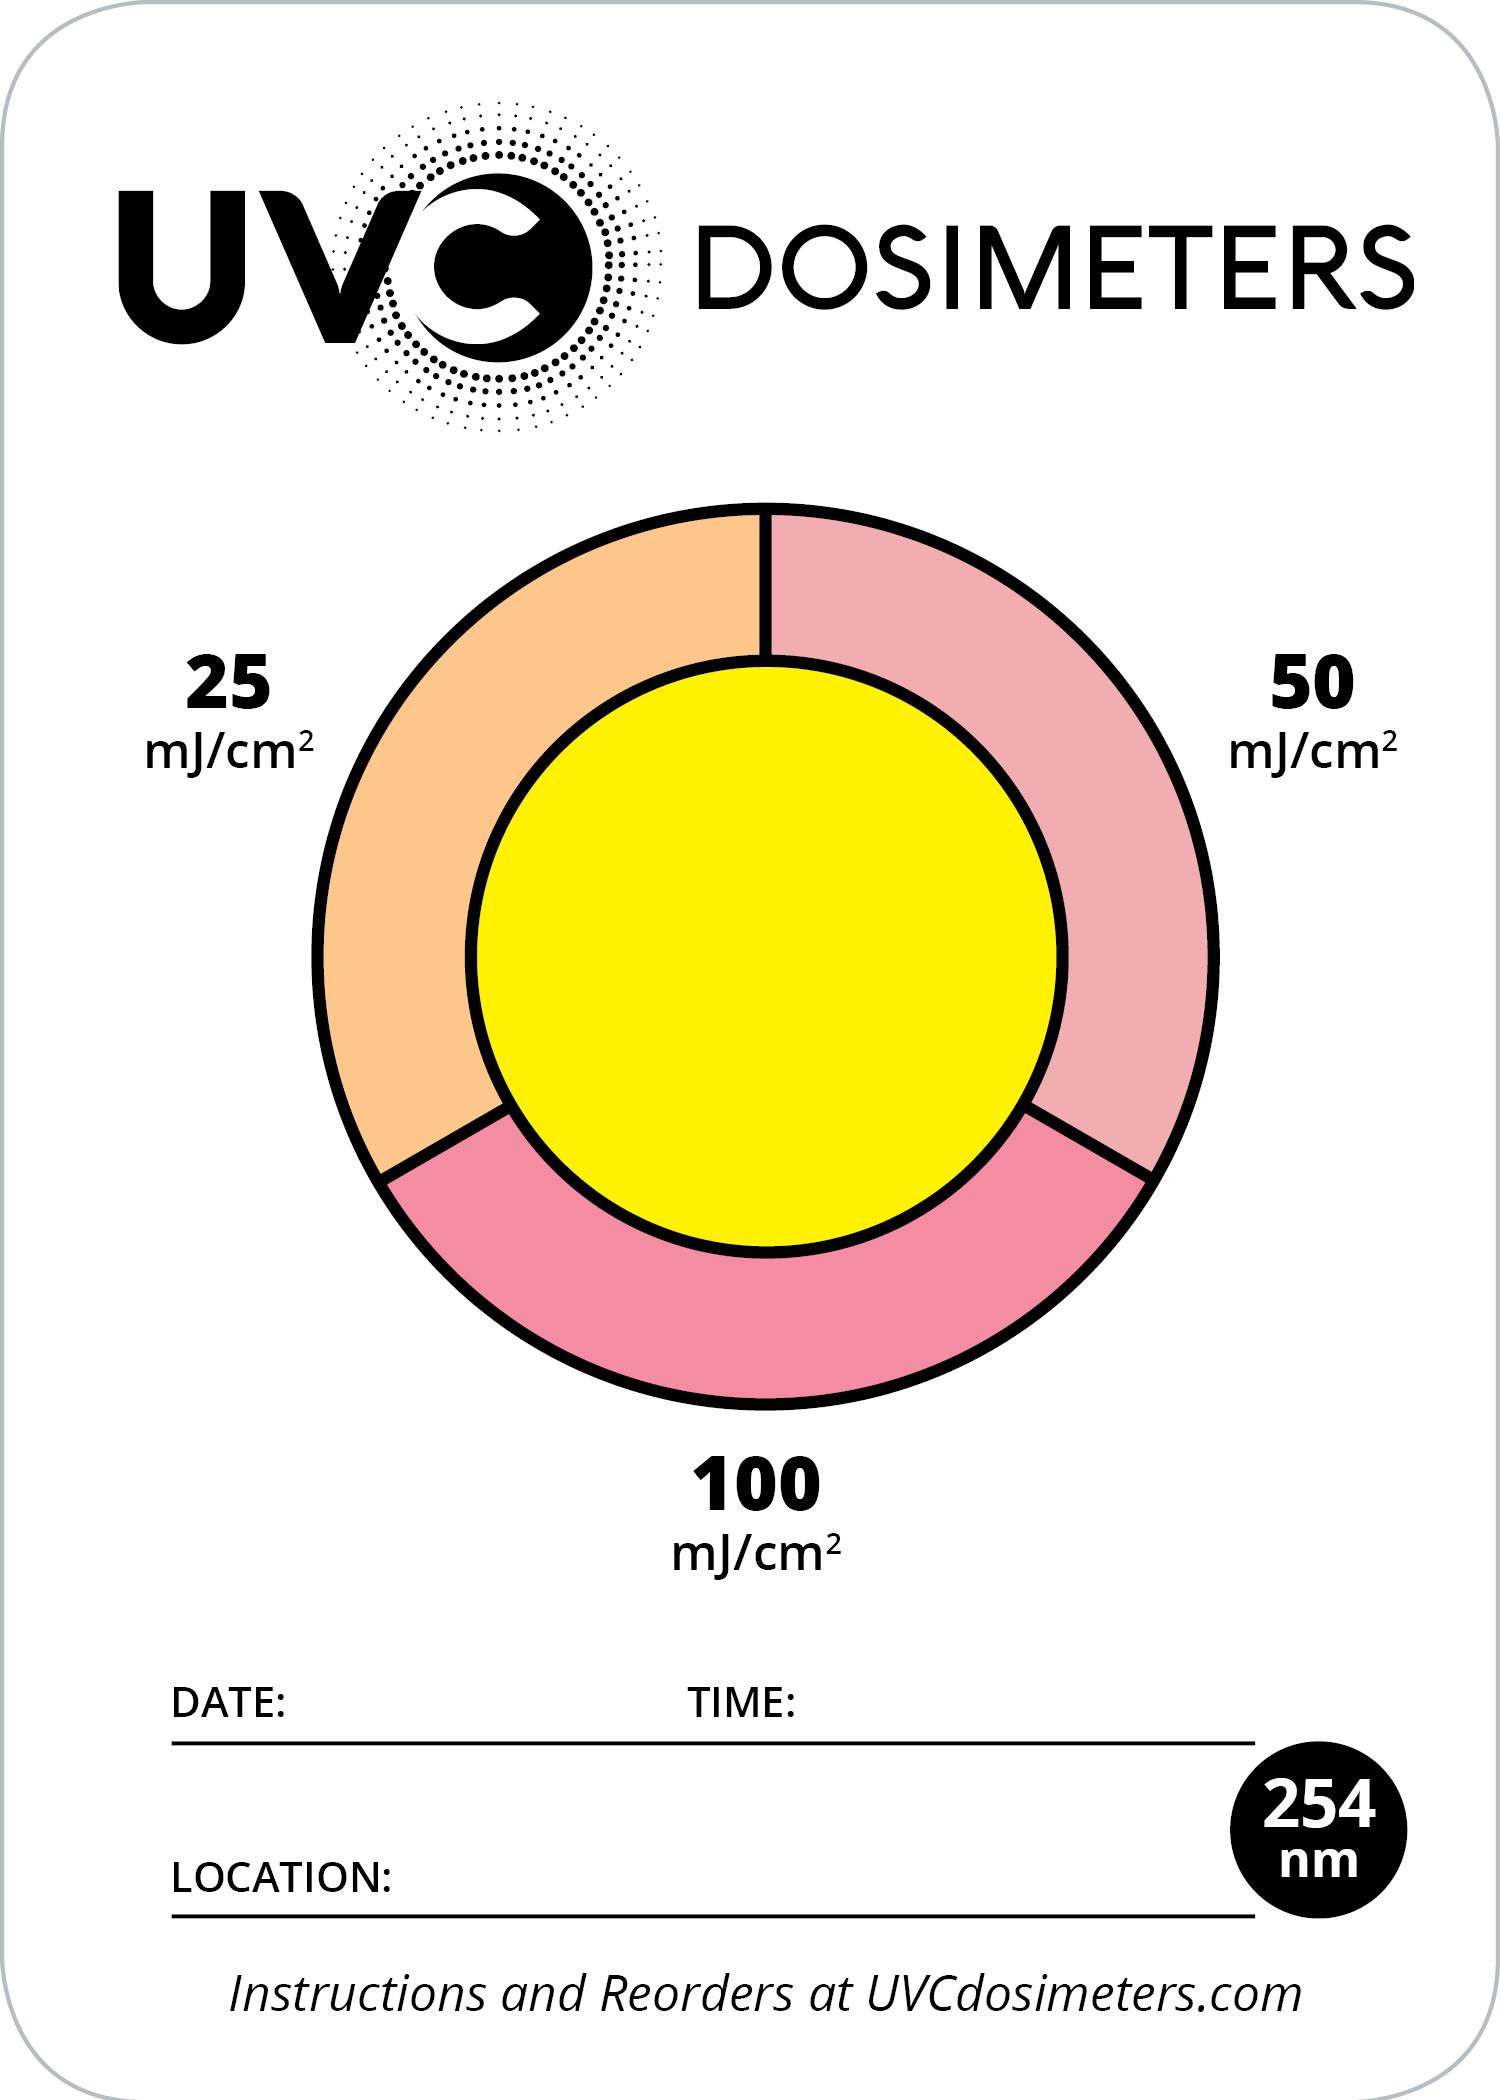 UVC 1000 dosimeters